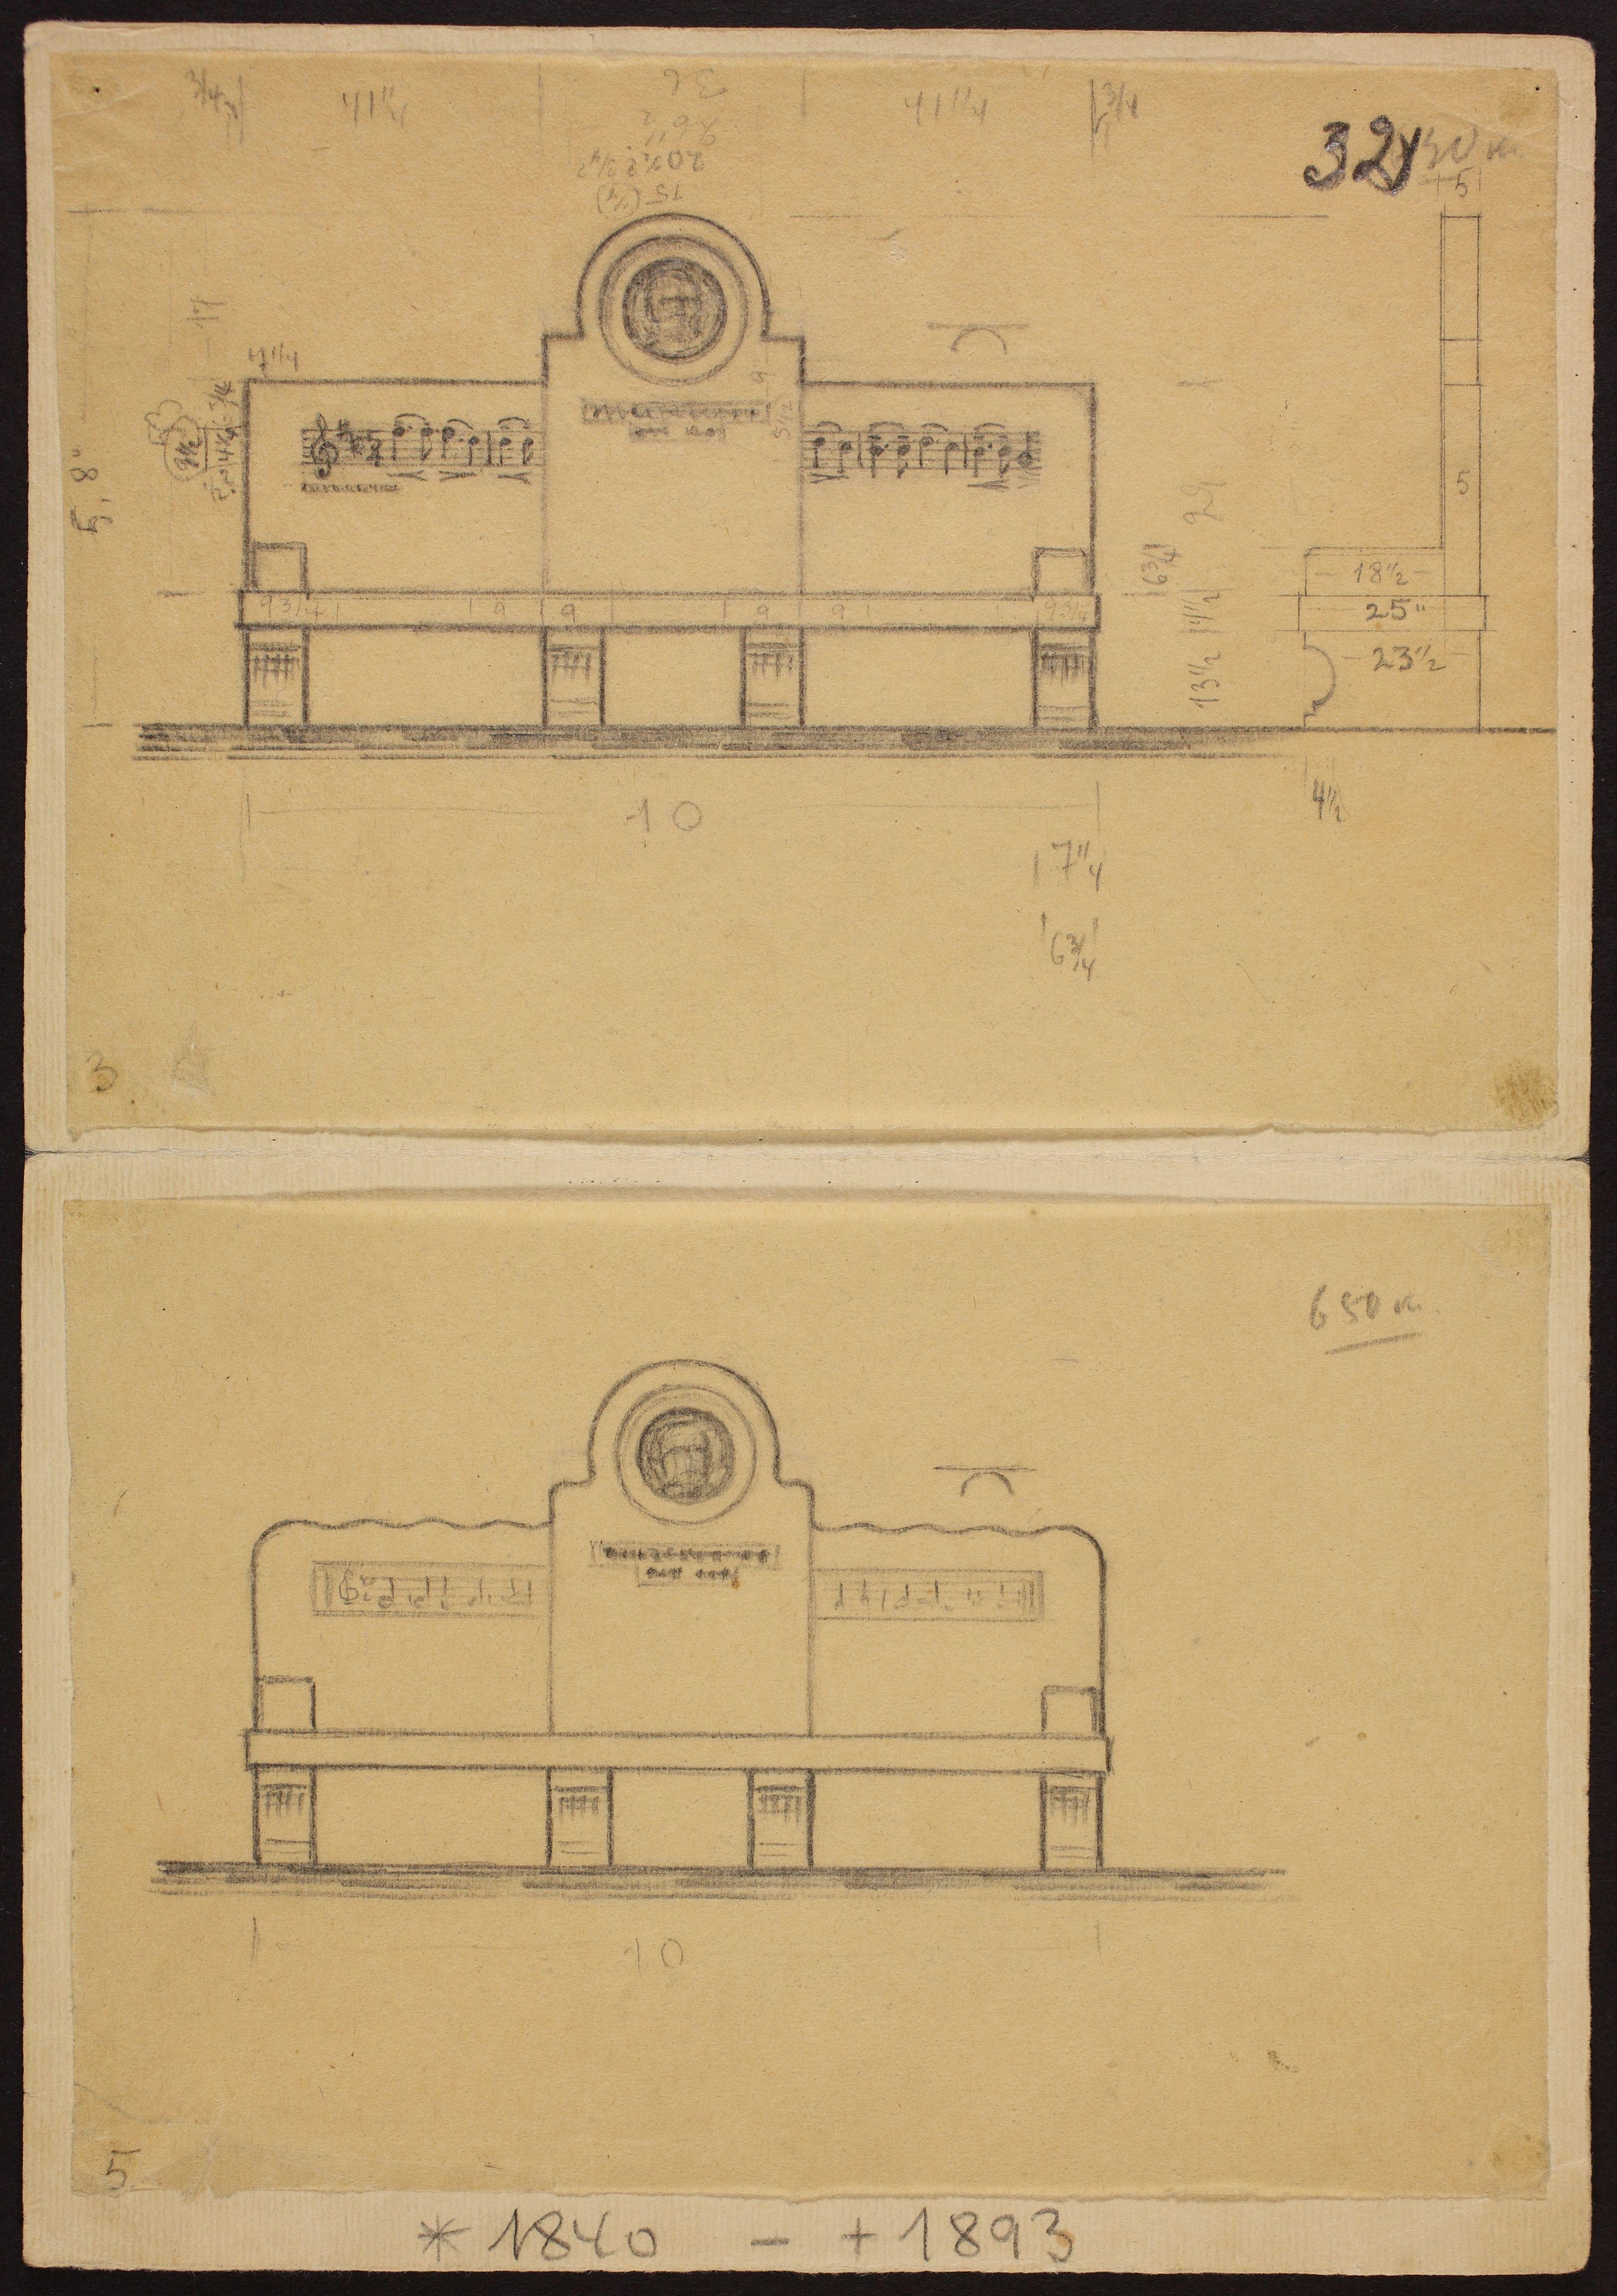 P. I. Tšaikovski pingi projekt, 1940. ERA.R-1903.1.12.32